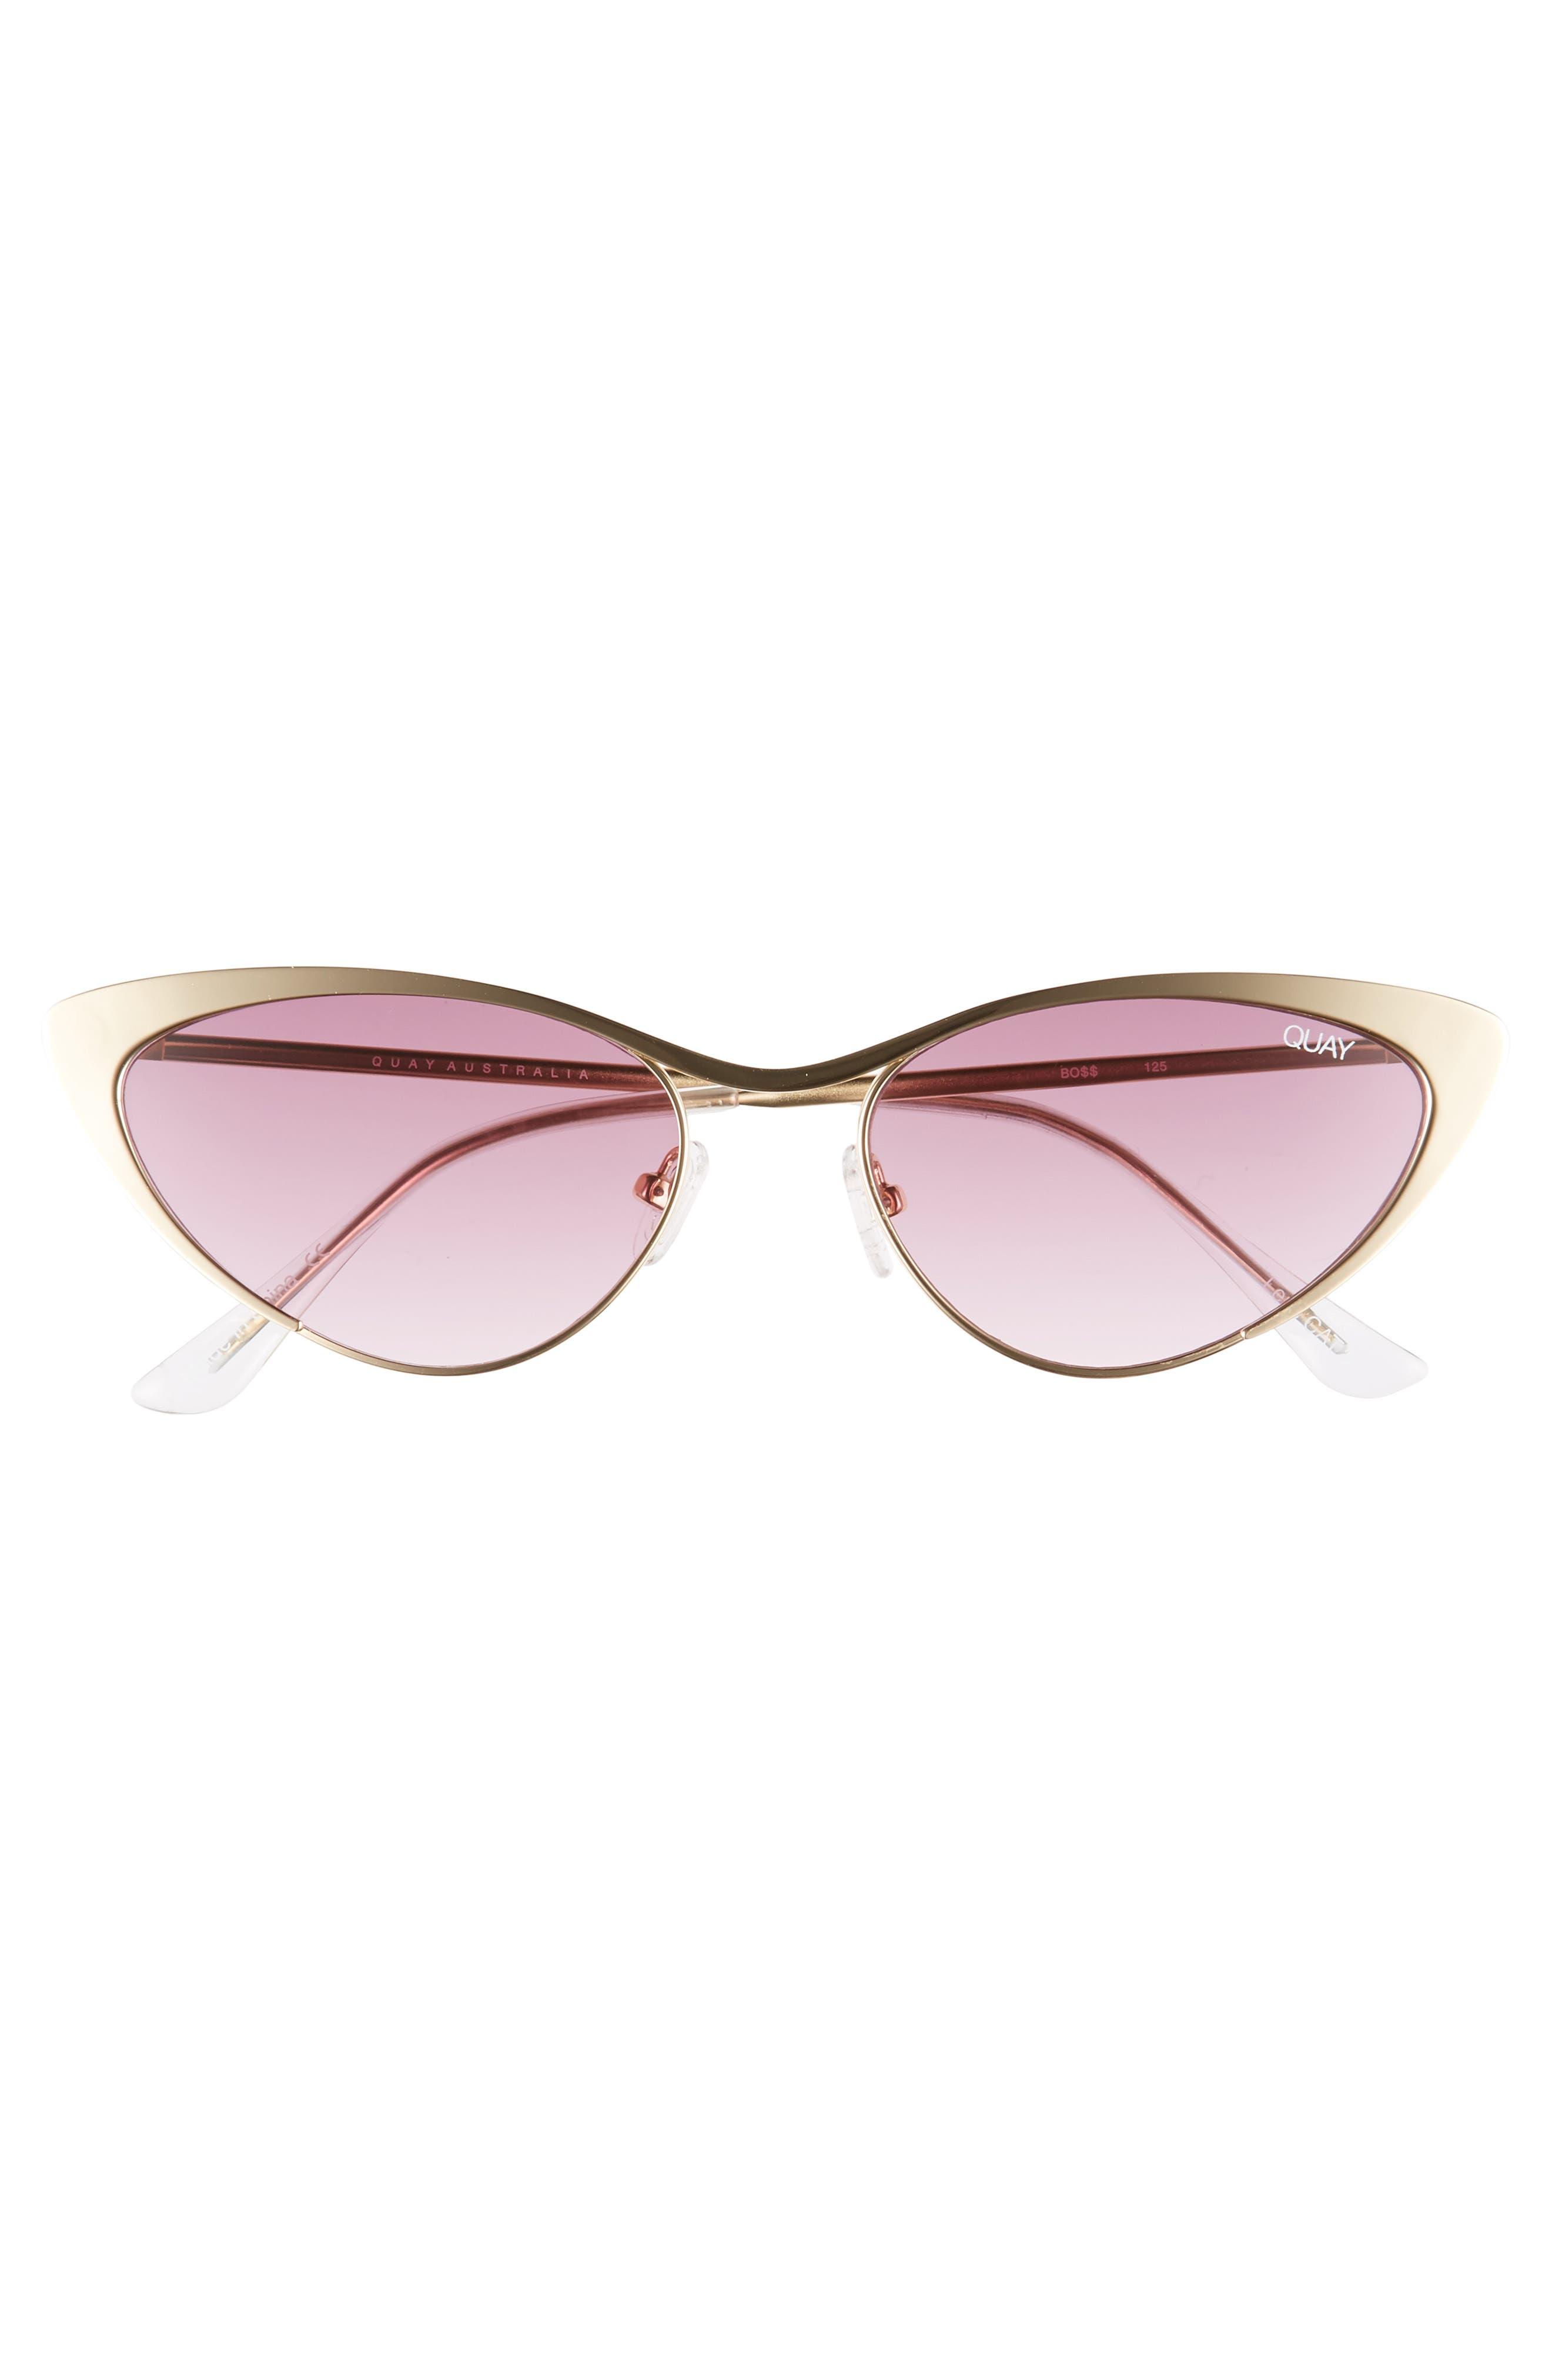 Boss 53mm Cat Eye Sunglasses,                             Alternate thumbnail 3, color,                             GOLD/ PURPLE